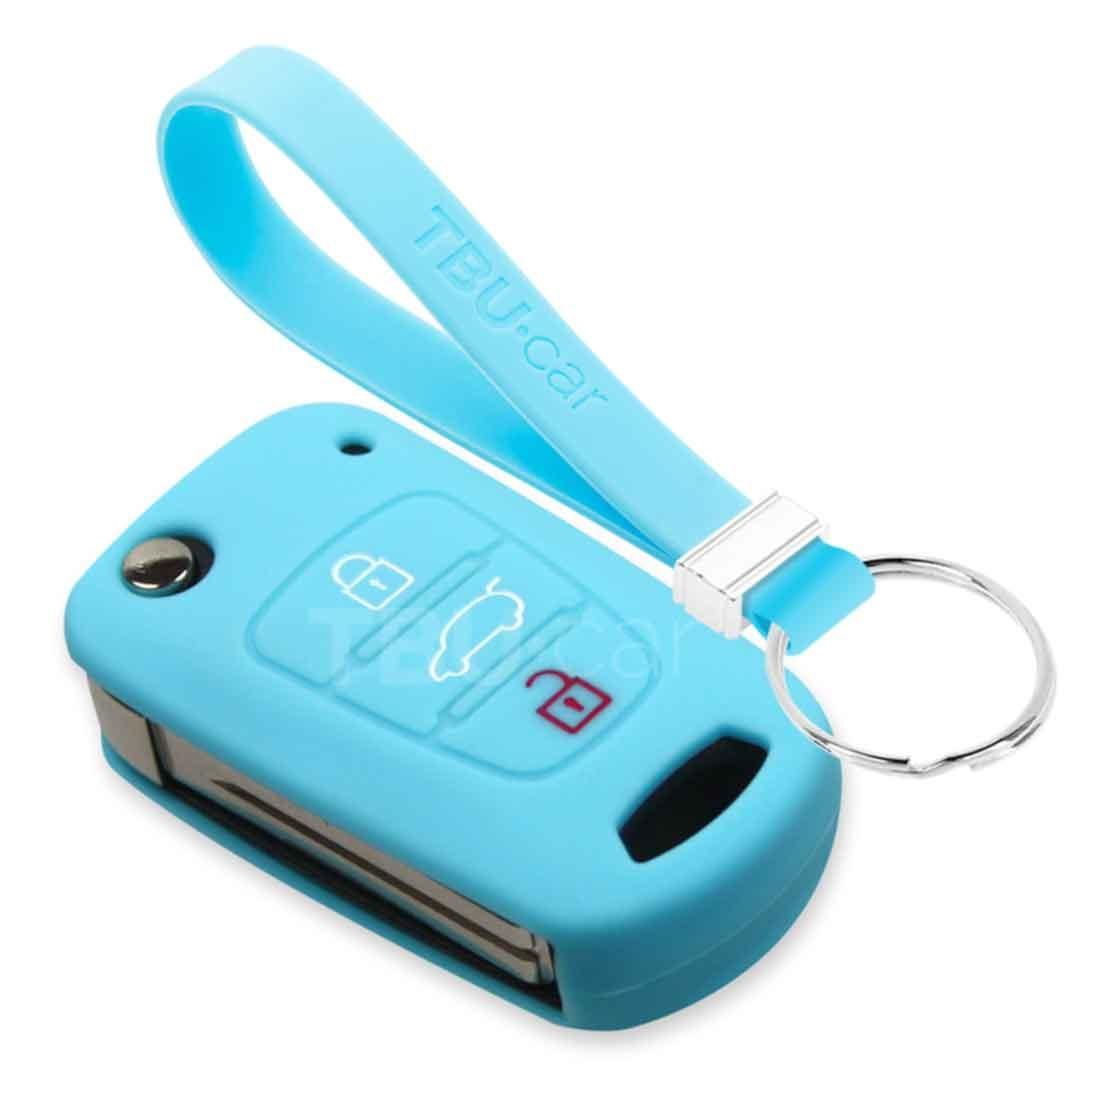 TBU car TBU car Sleutel cover compatibel met Hyundai - Silicone sleutelhoesje - beschermhoesje autosleutel - Lichtblauw